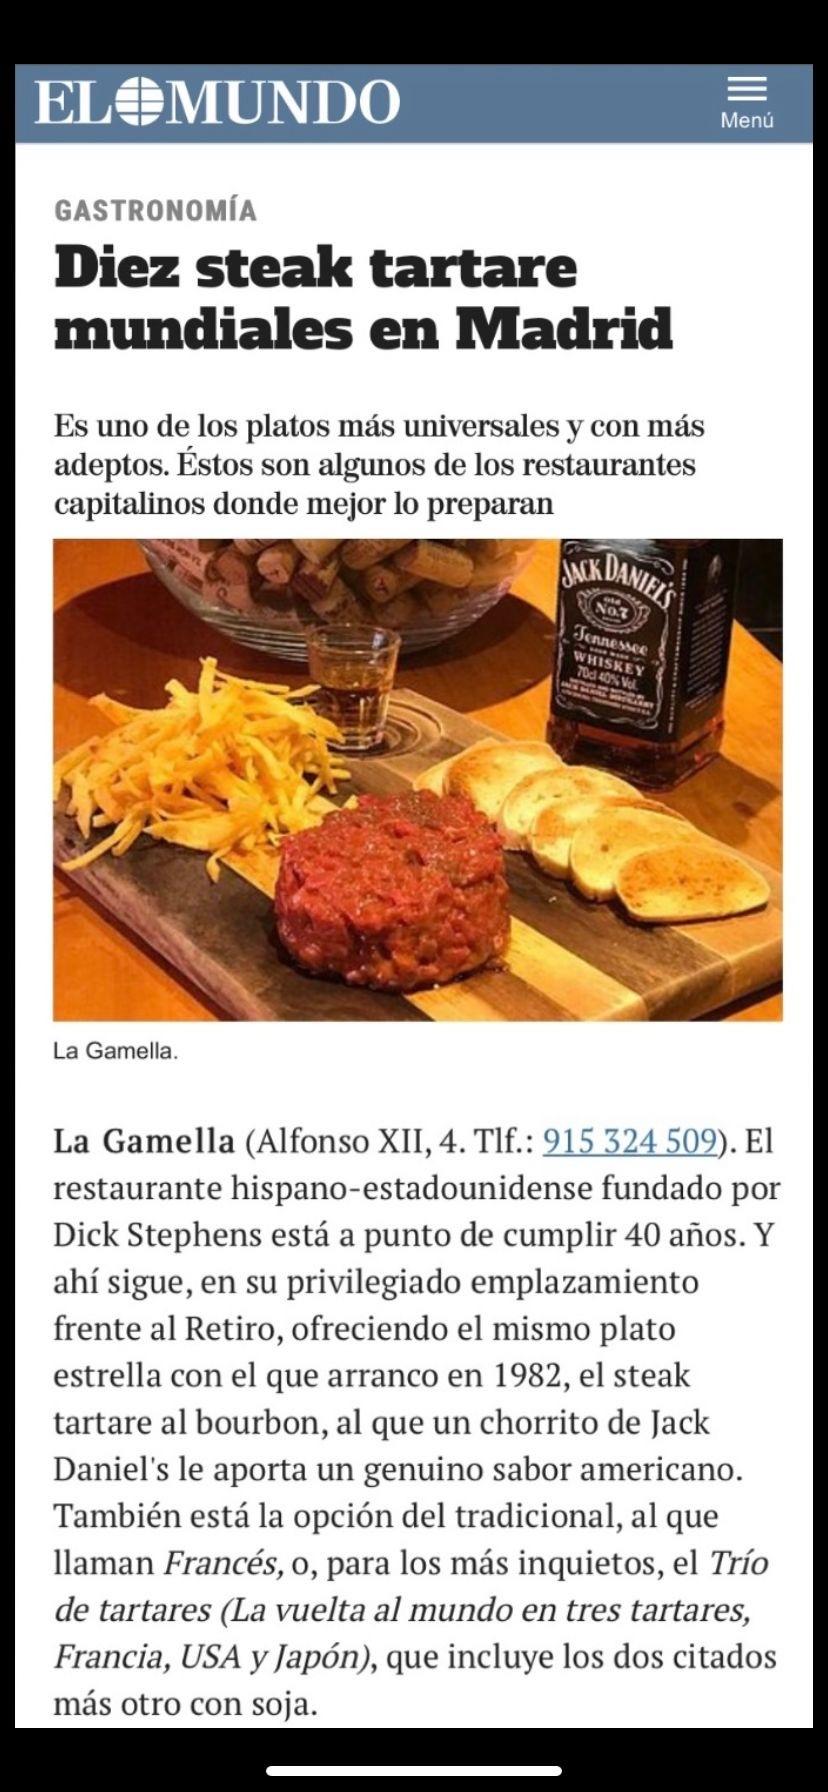 Diez steak tartare mundiales en Madrid